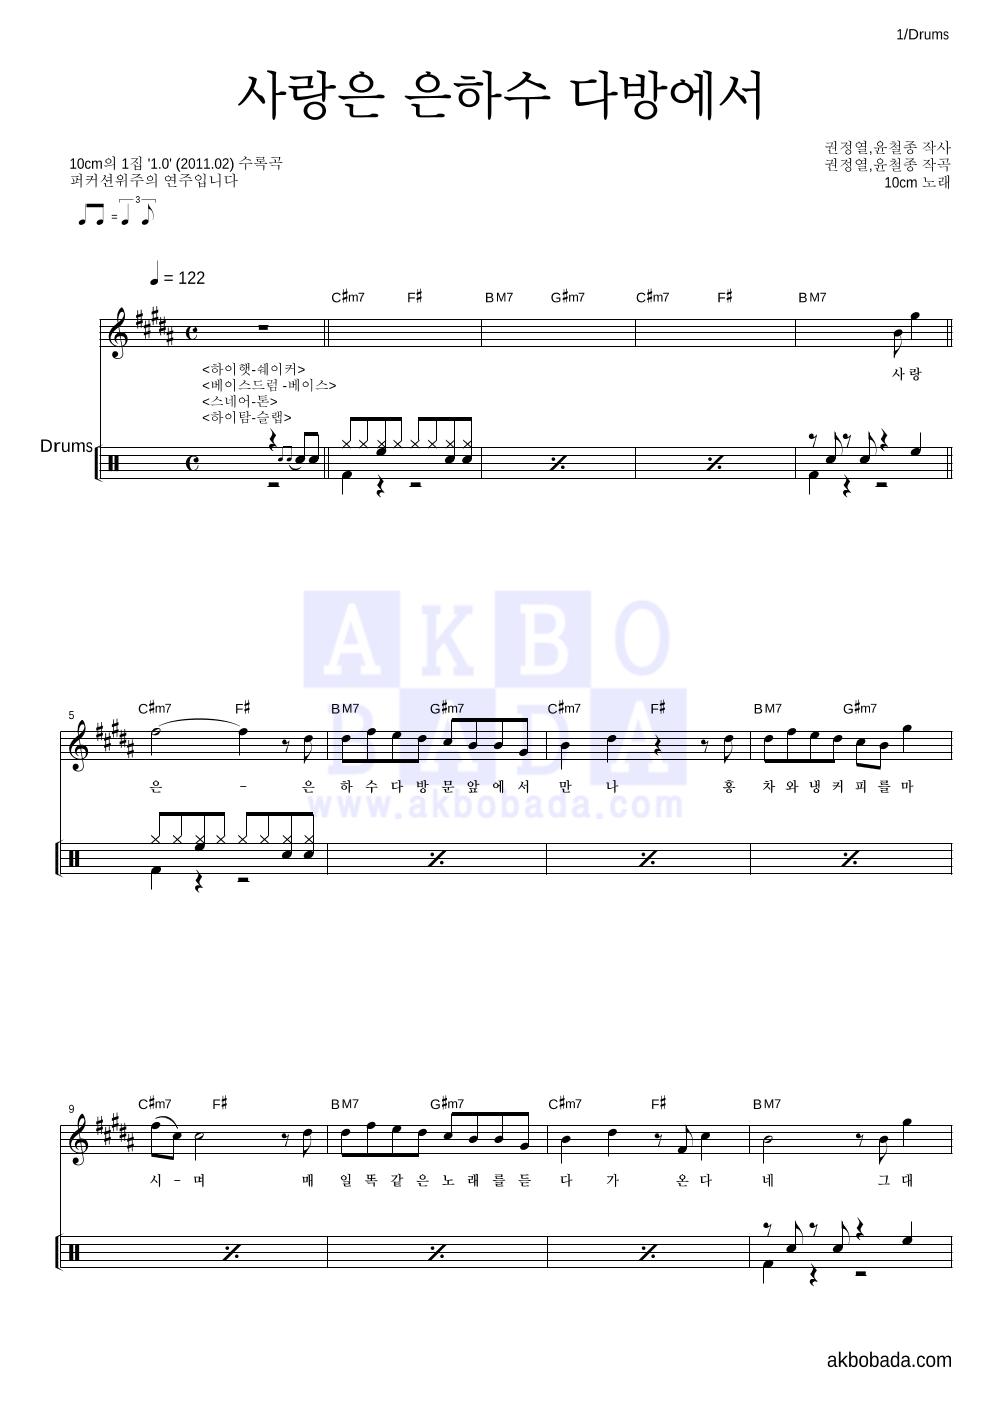 10CM - 사랑은 은하수 다방에서 드럼 악보